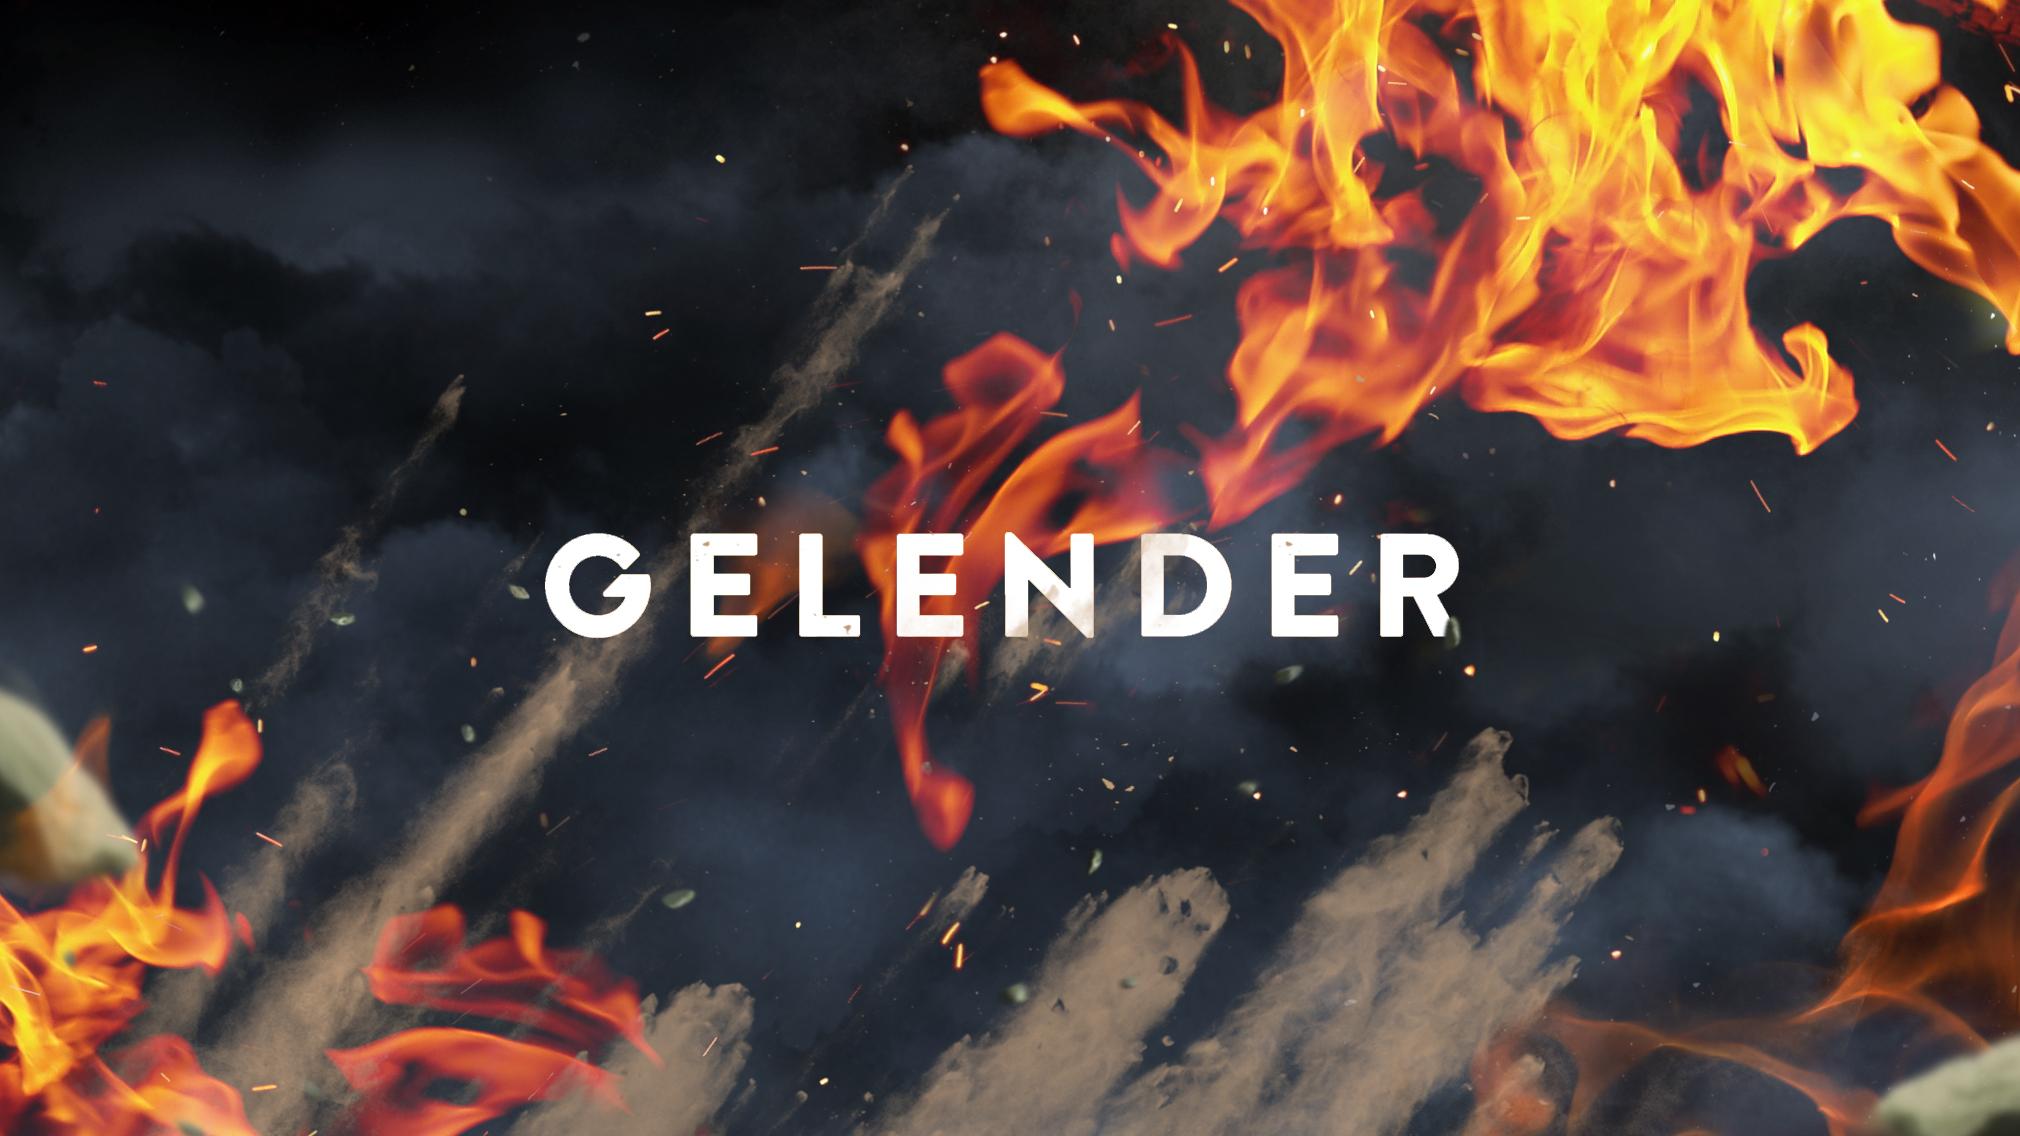 Gelender Craft Beer Limited Edition